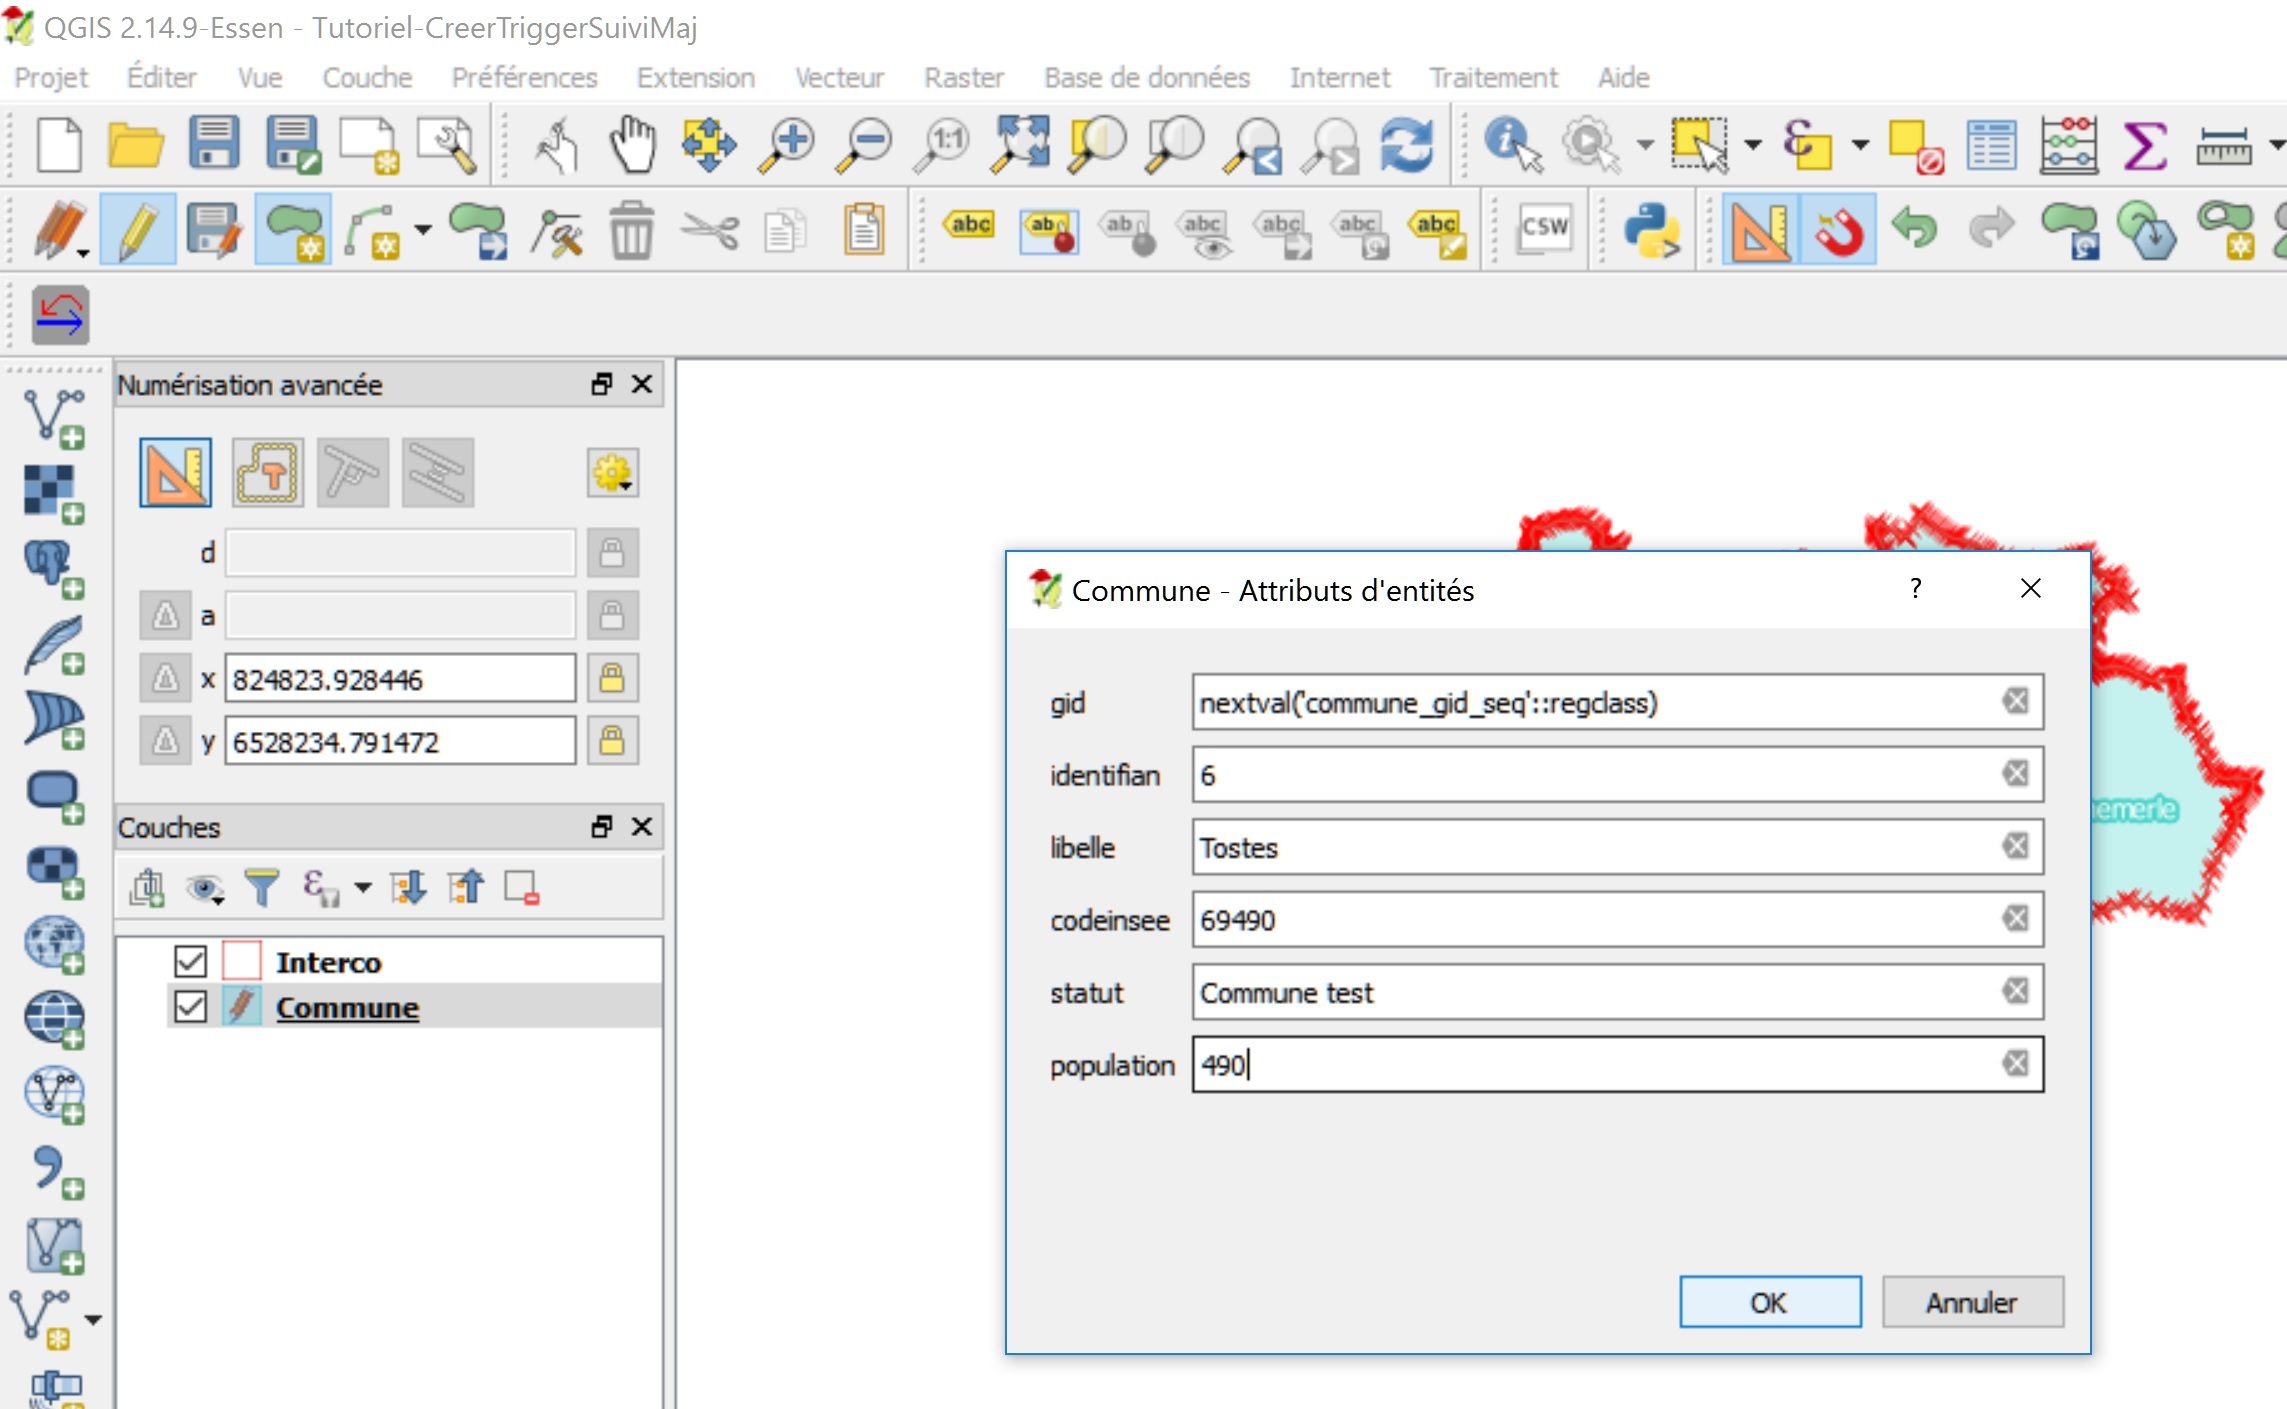 Tutoriel Impuls'Map - Trigger suivi mises à jour PostgreSQL PostGIS - QGIS données attributaires